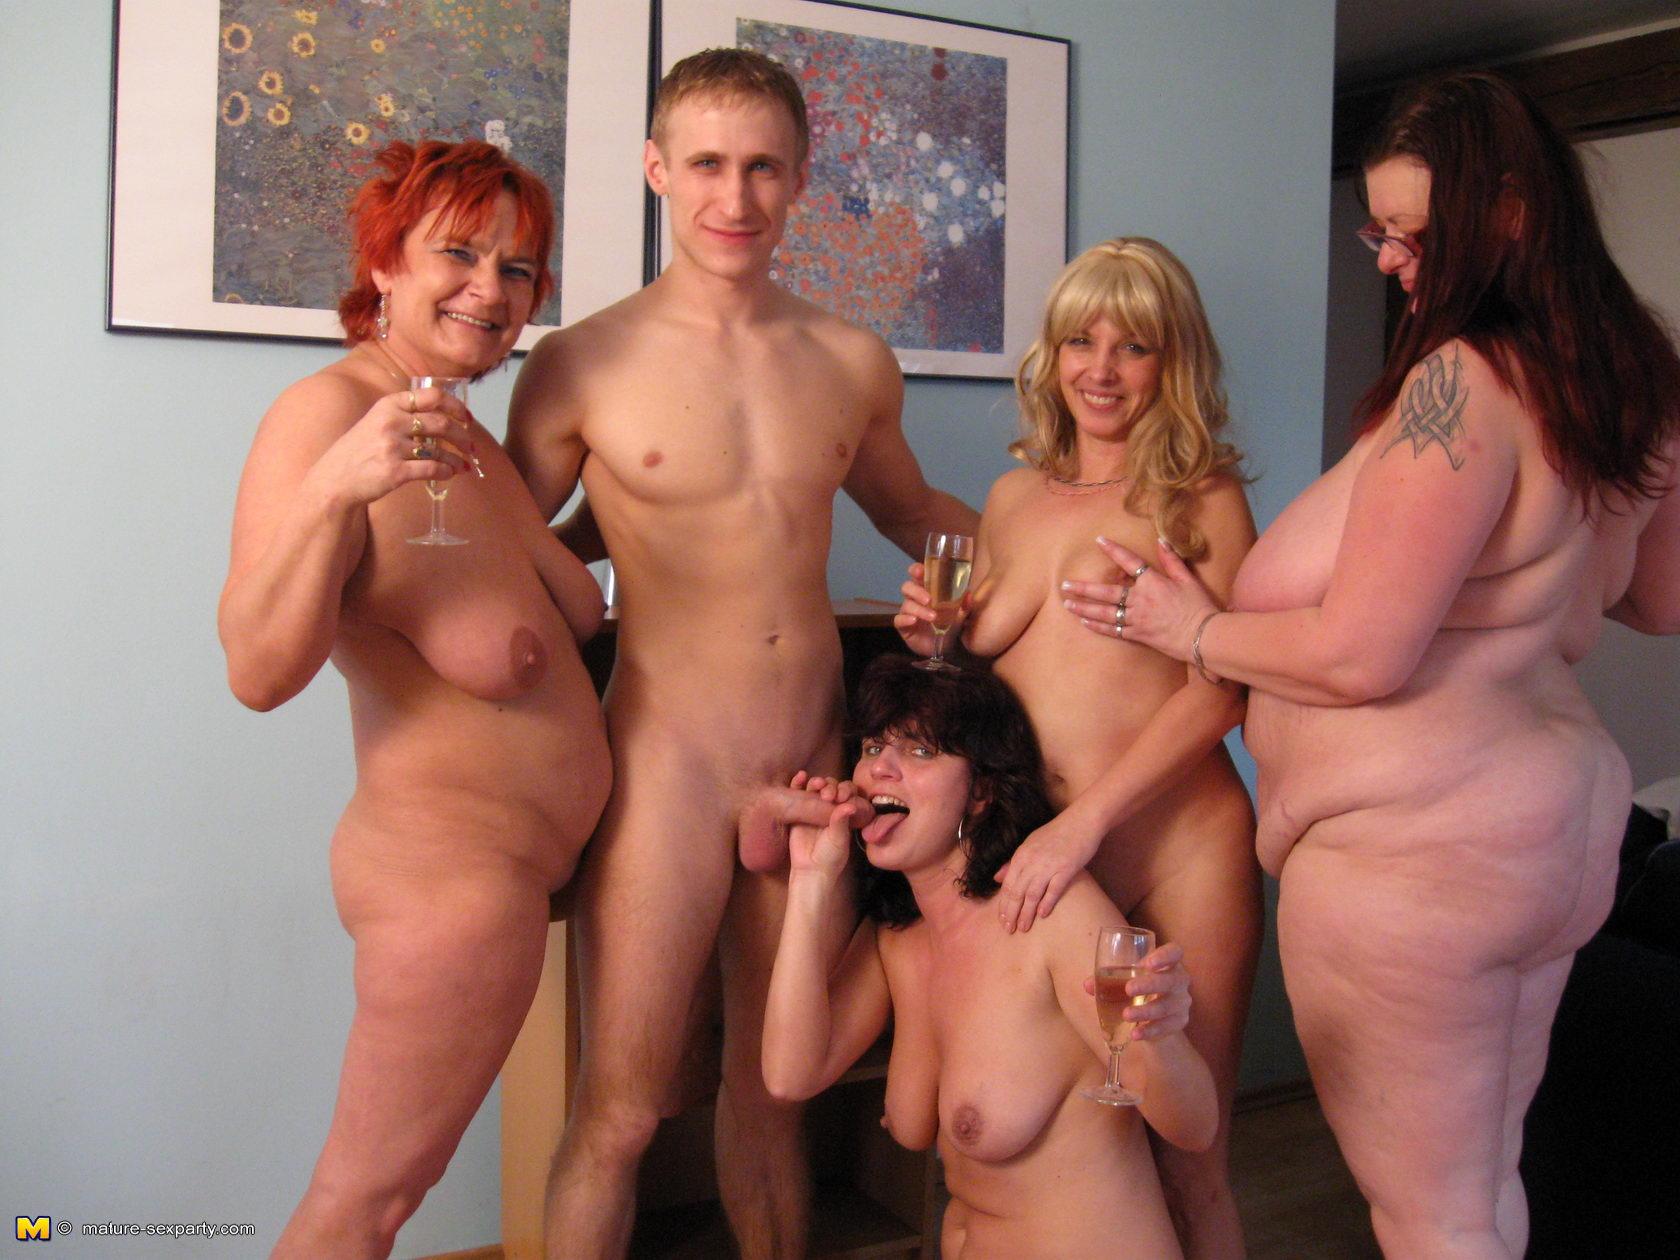 Nude midget pic gallery